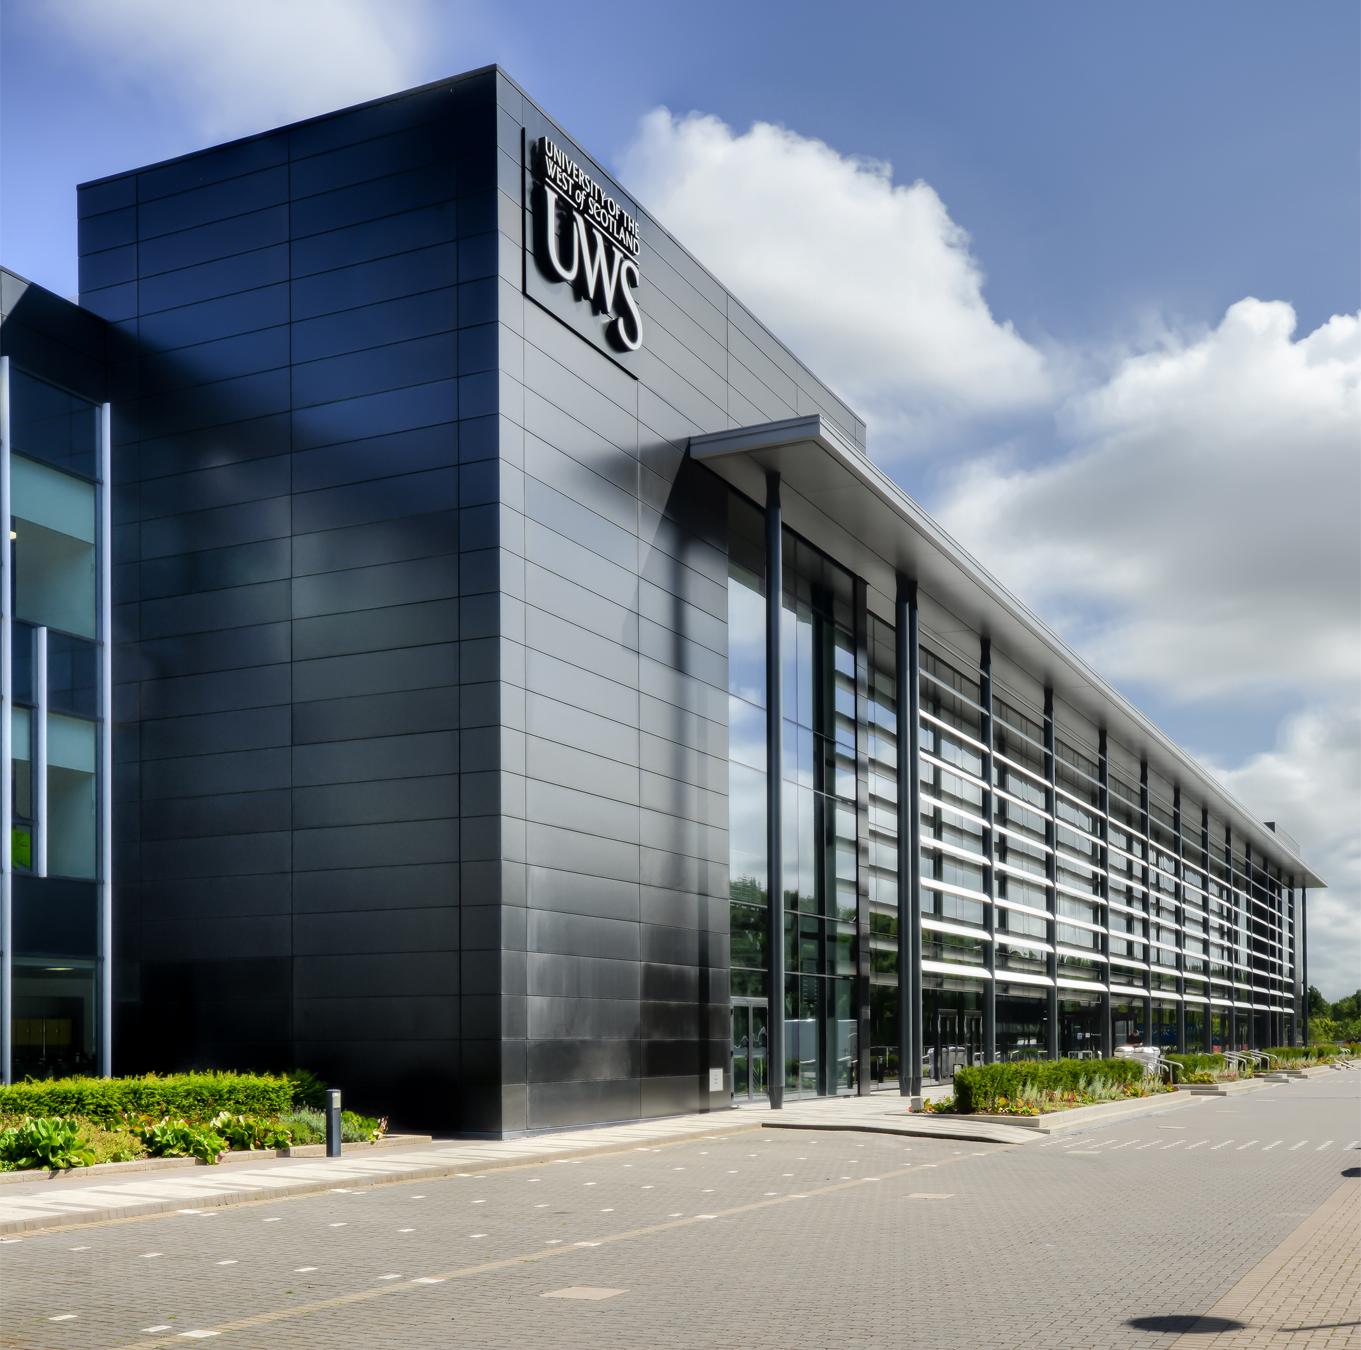 UWS Lanarkshire UK winner of The Guardian University Awards 2009 'Sustainable Buildings that inspire' category.